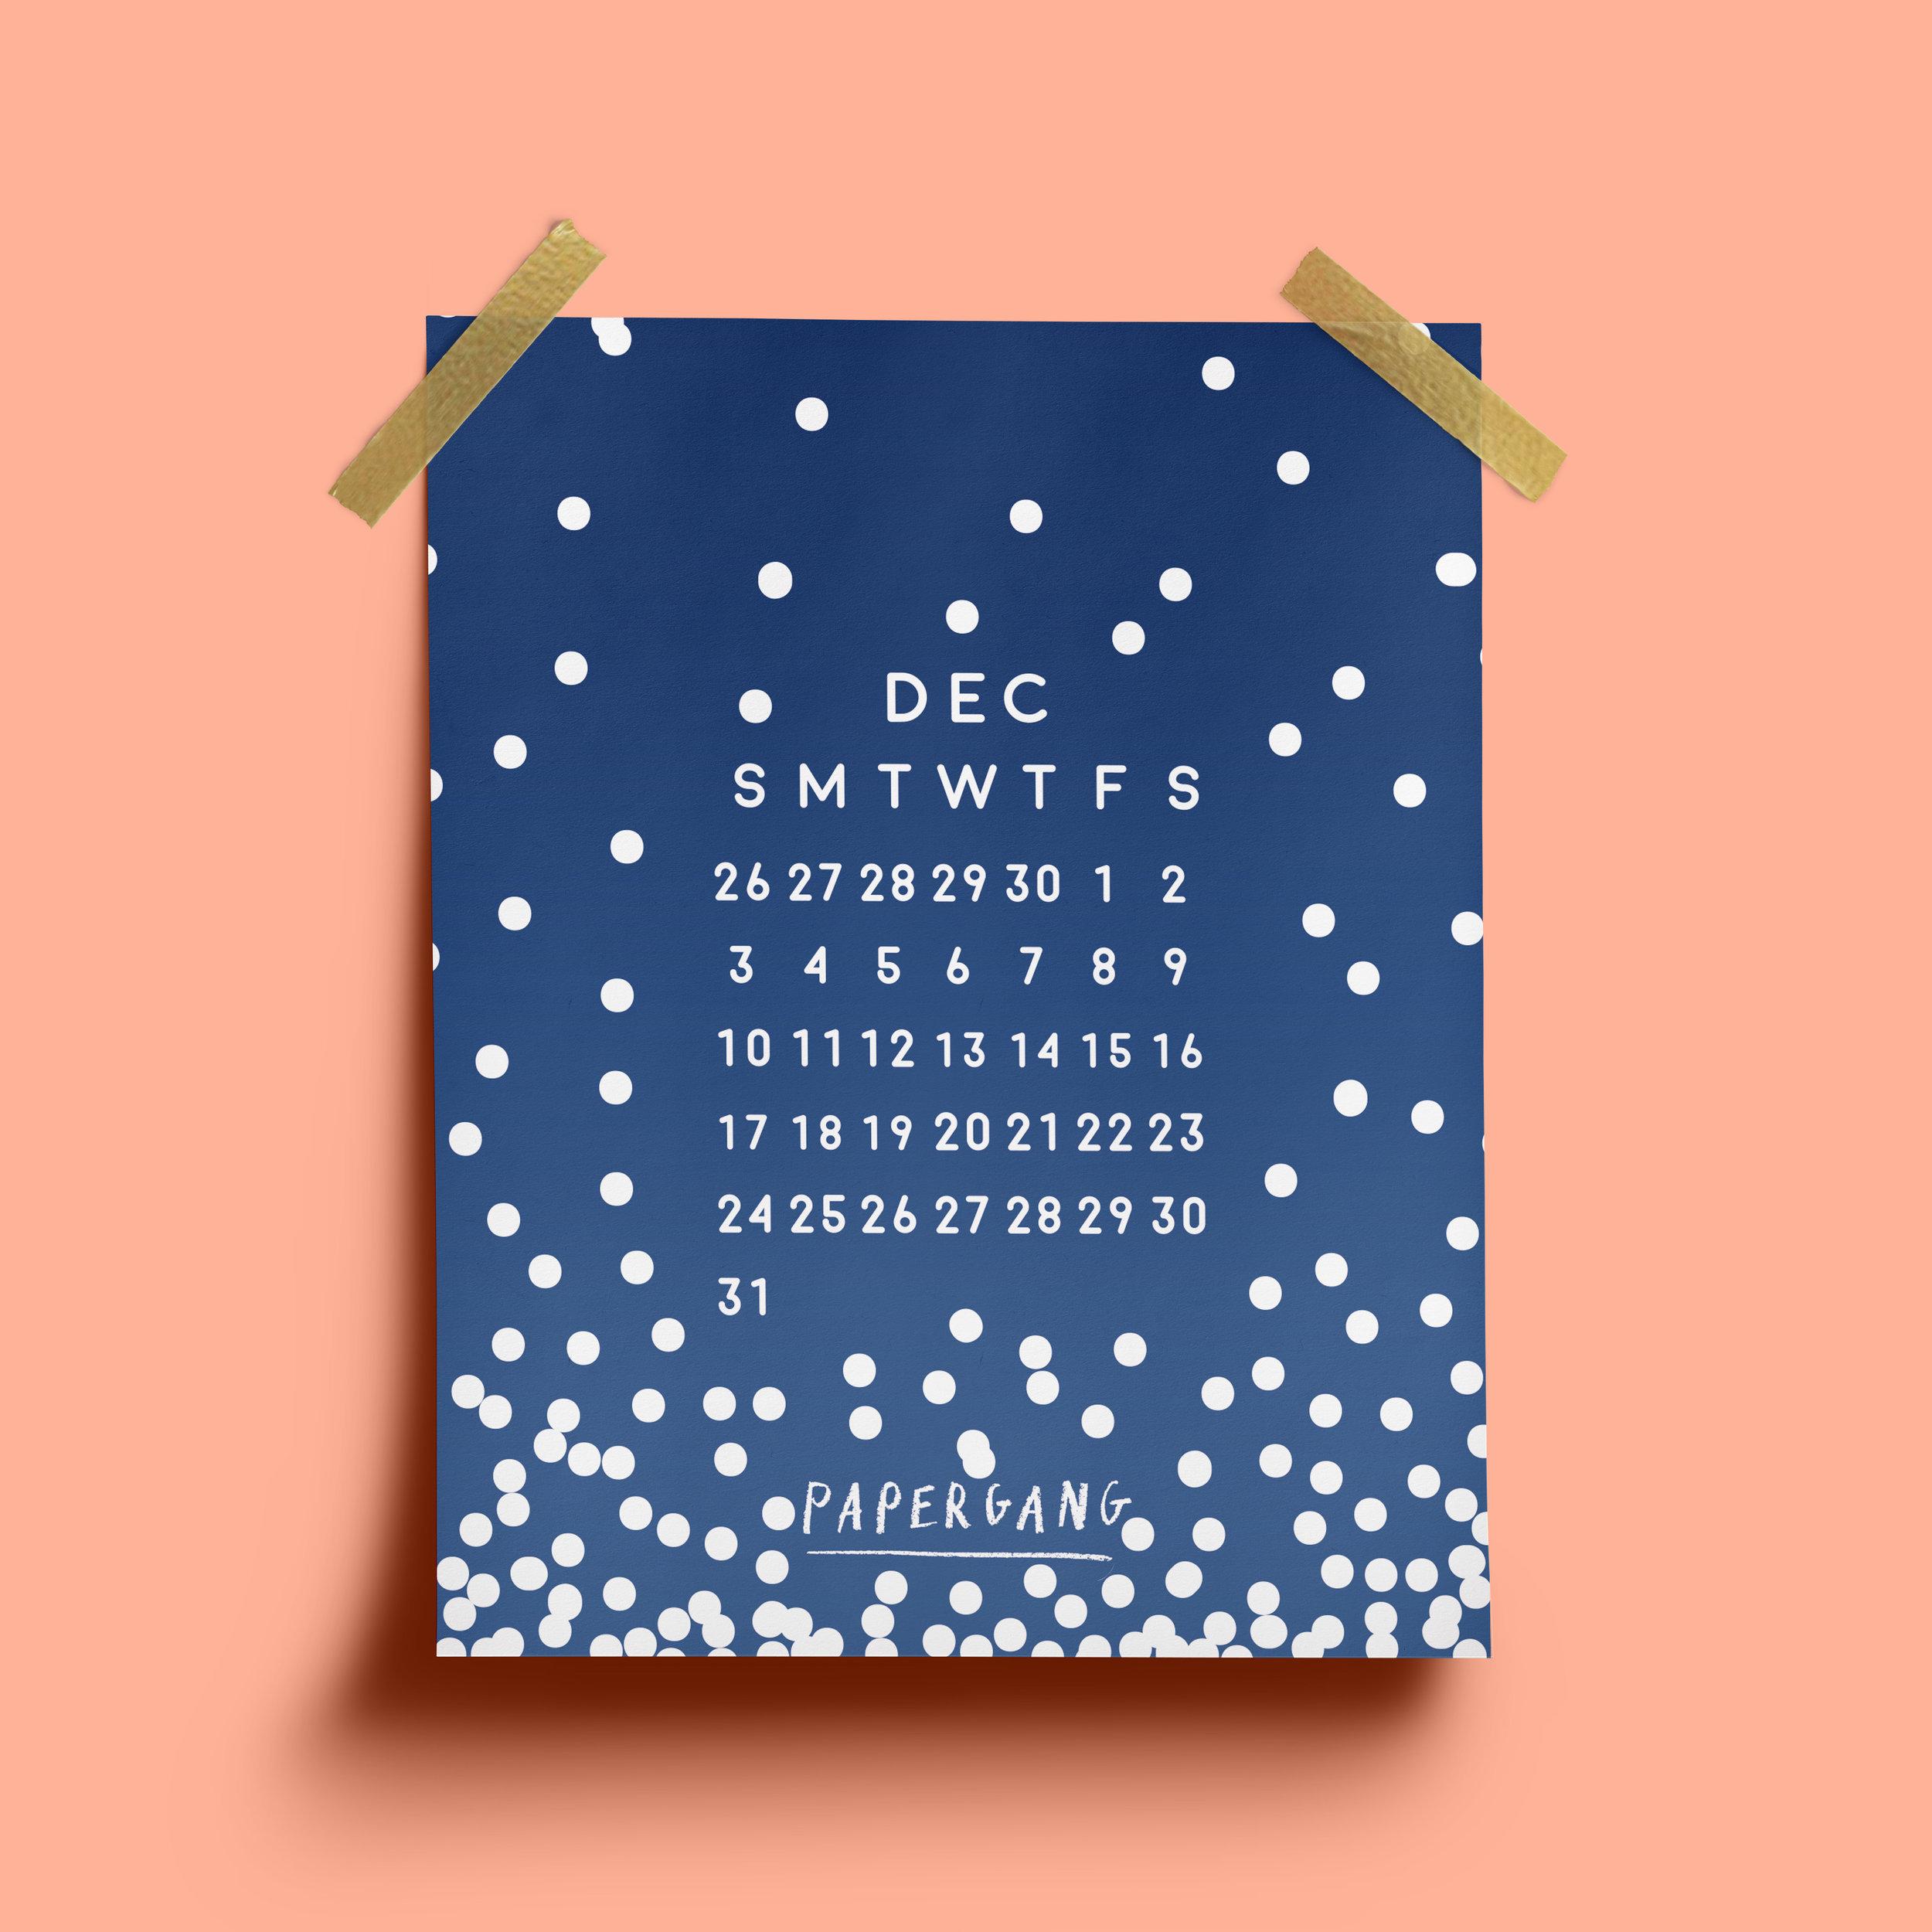 Papergang-Dec-2017-Calendar-Mock-Up.jpg